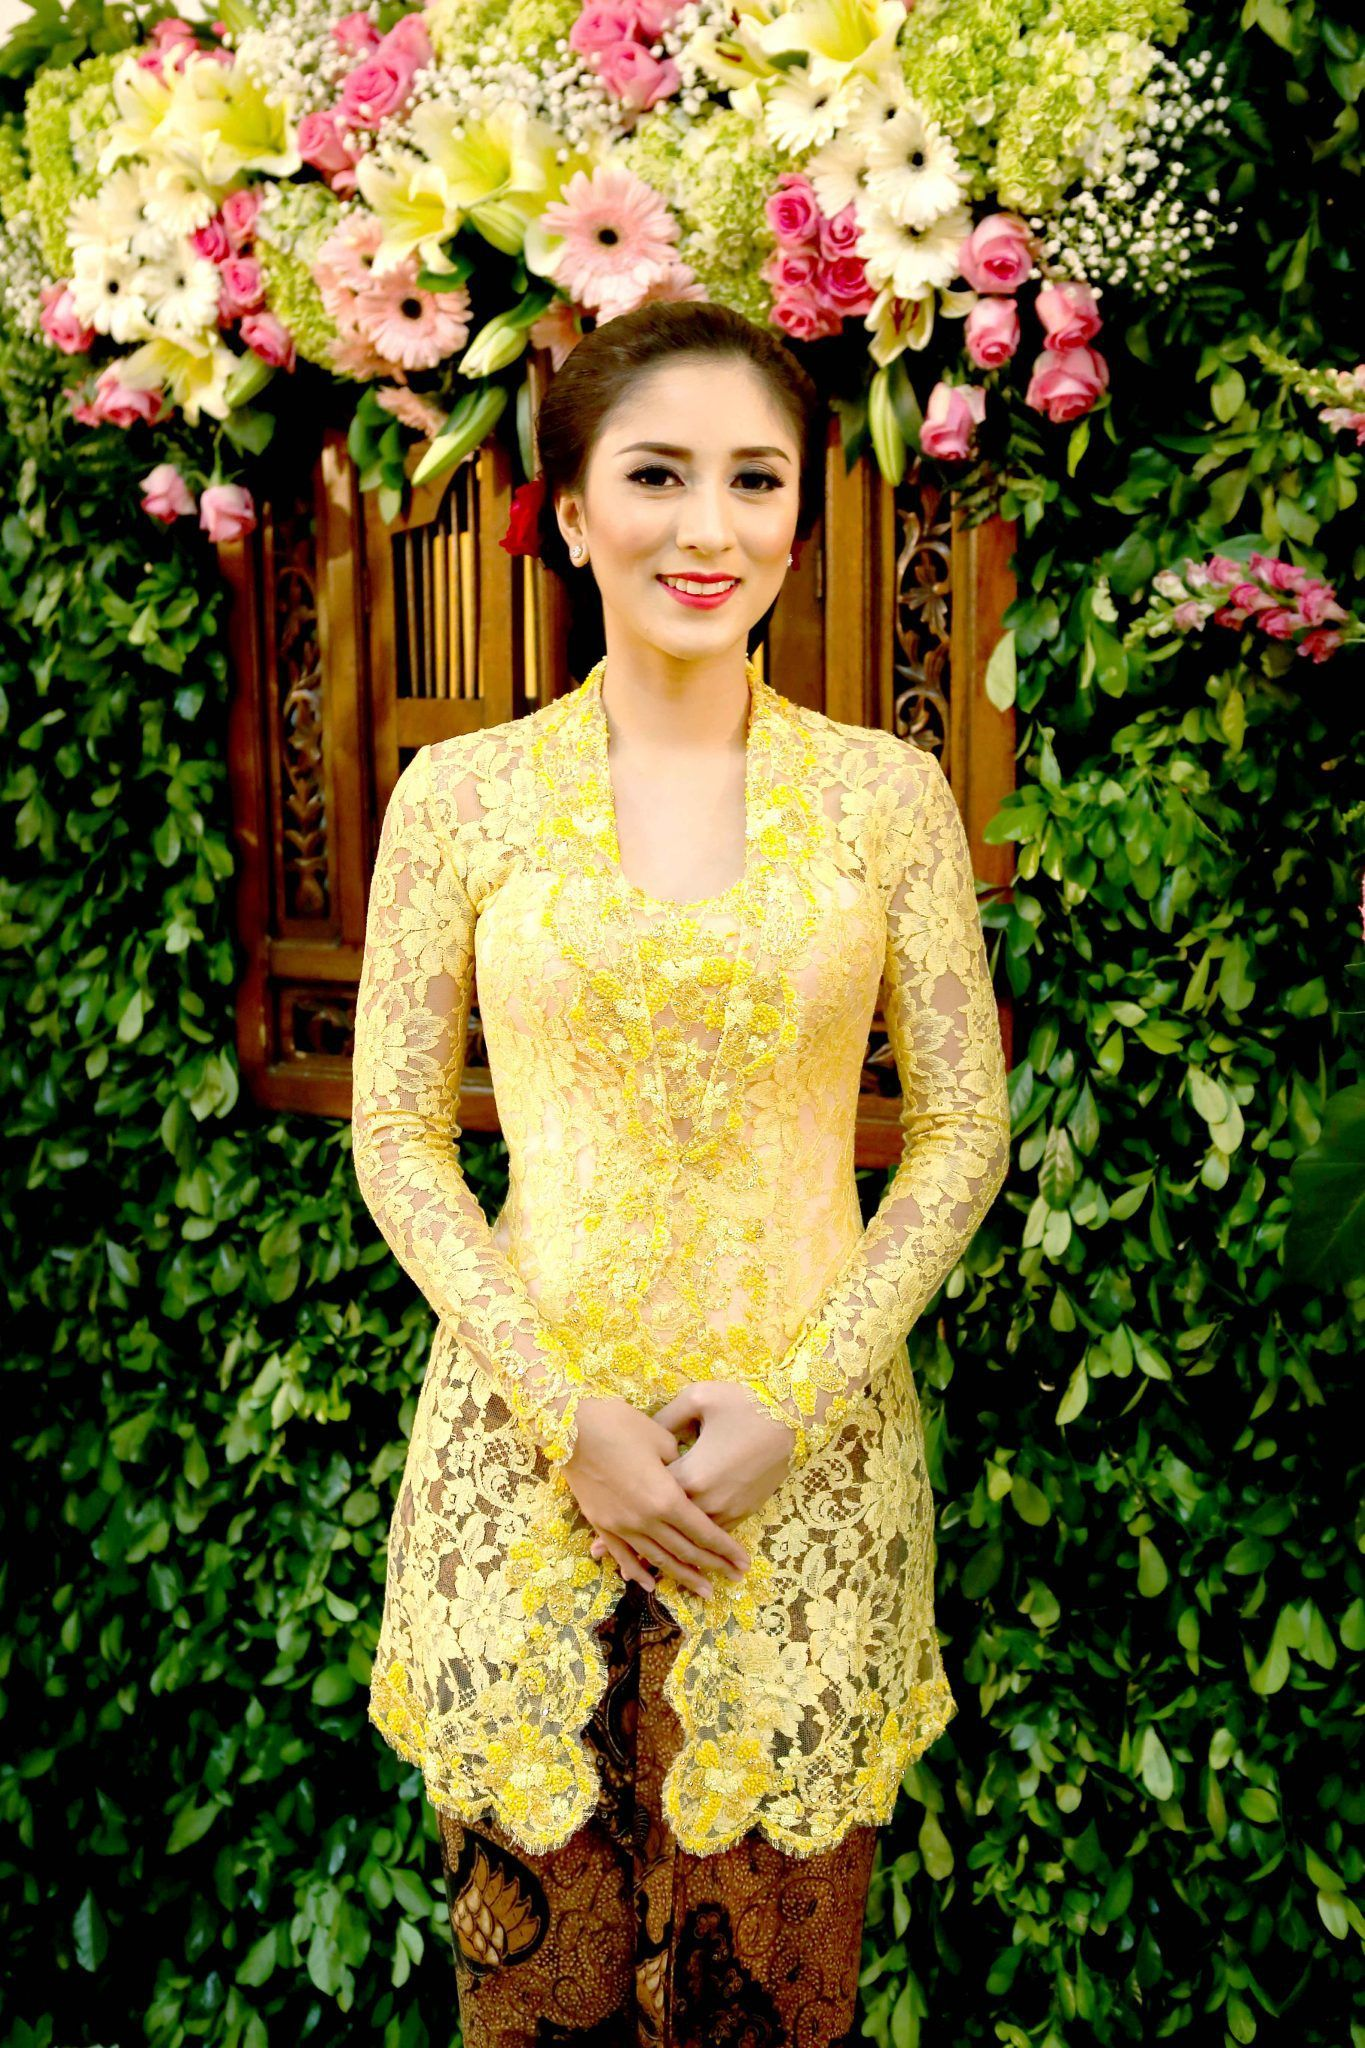 Acara Lamaran Adat Lampung ala Tantia dan Elno